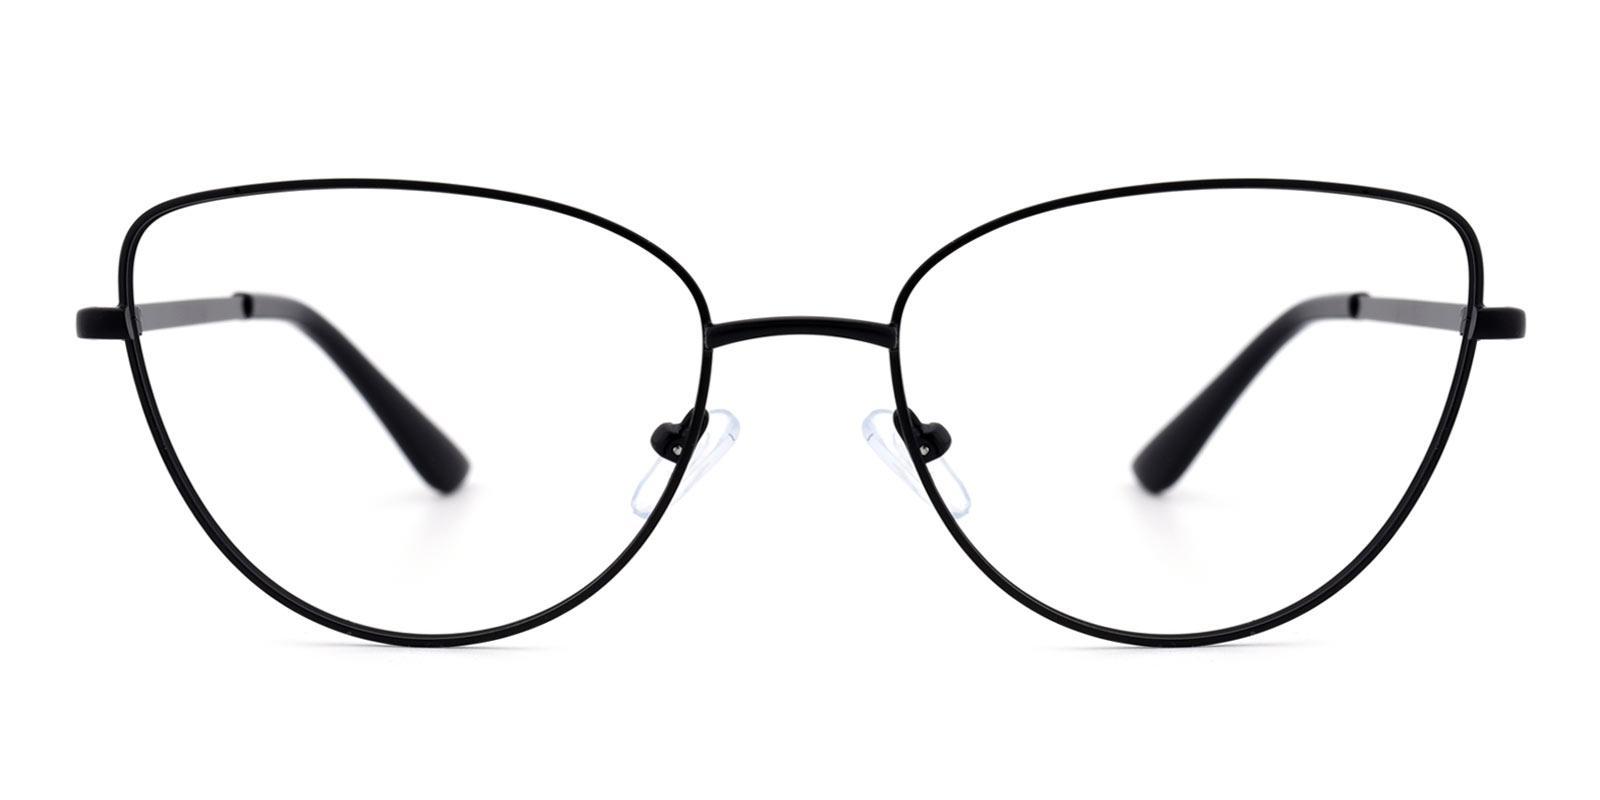 Lola-Black-Cat-Metal-Eyeglasses-detail